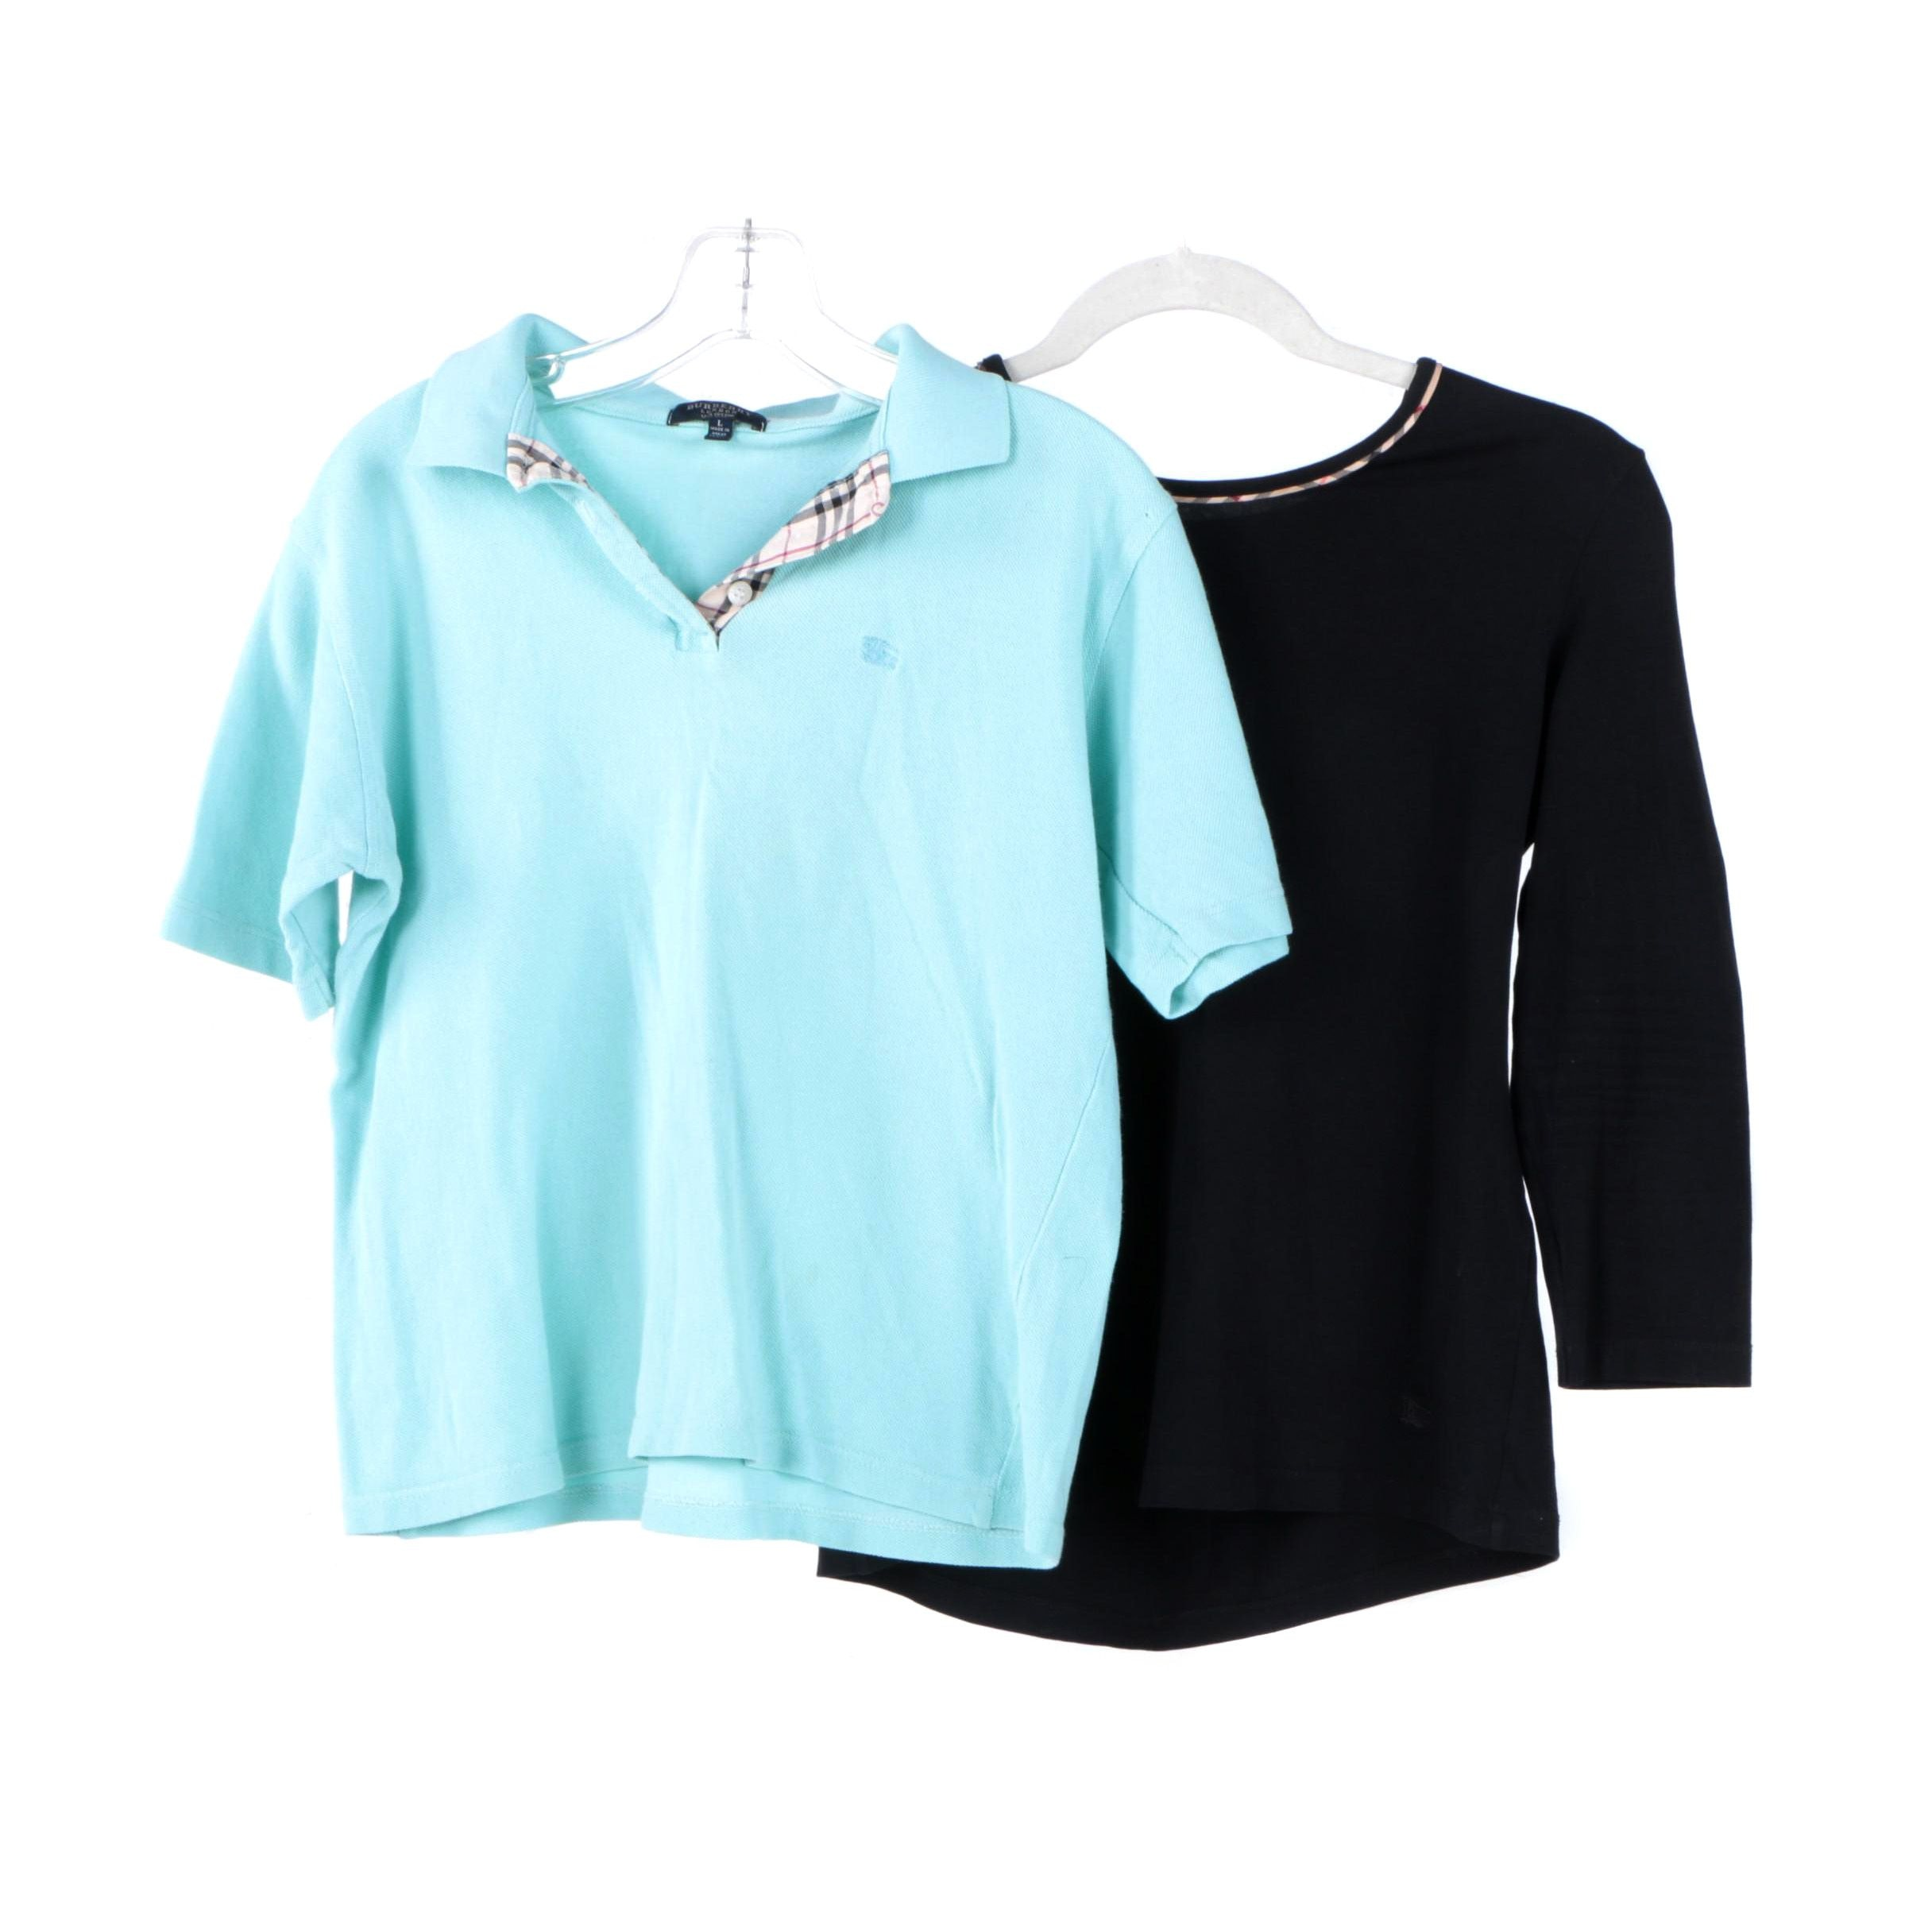 Women's Burberry Shirts